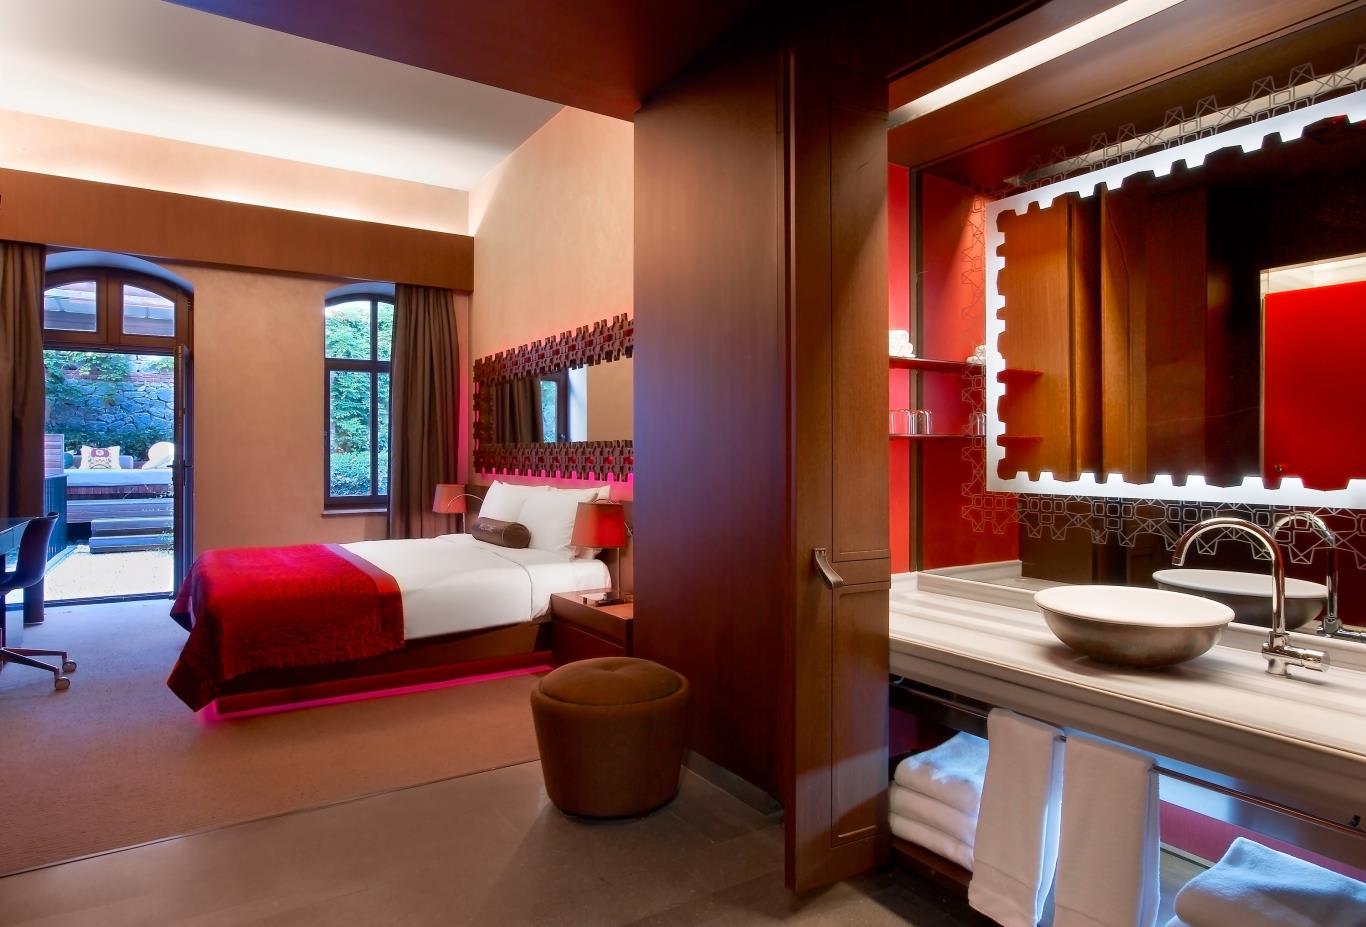 Marvelous Room